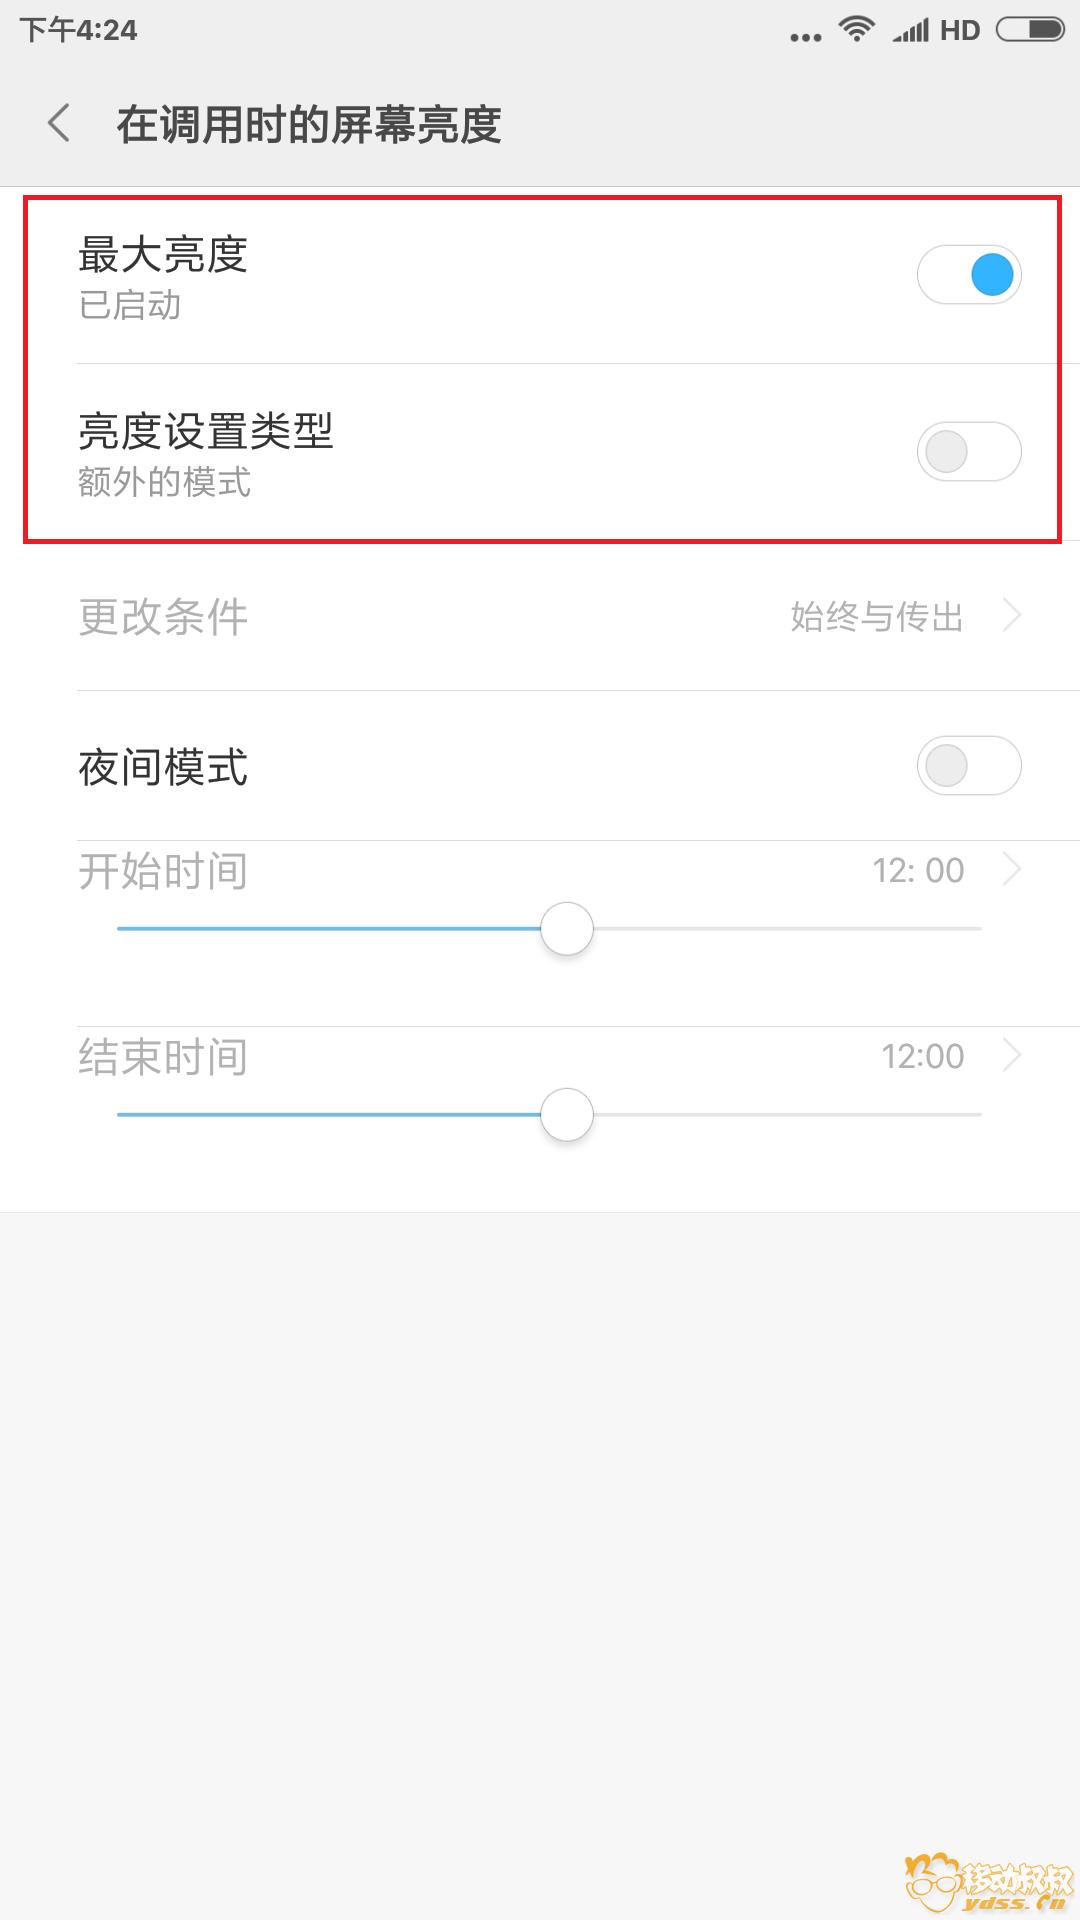 Screenshot_2018-05-19-16-24-20-023_com.android.phone.png